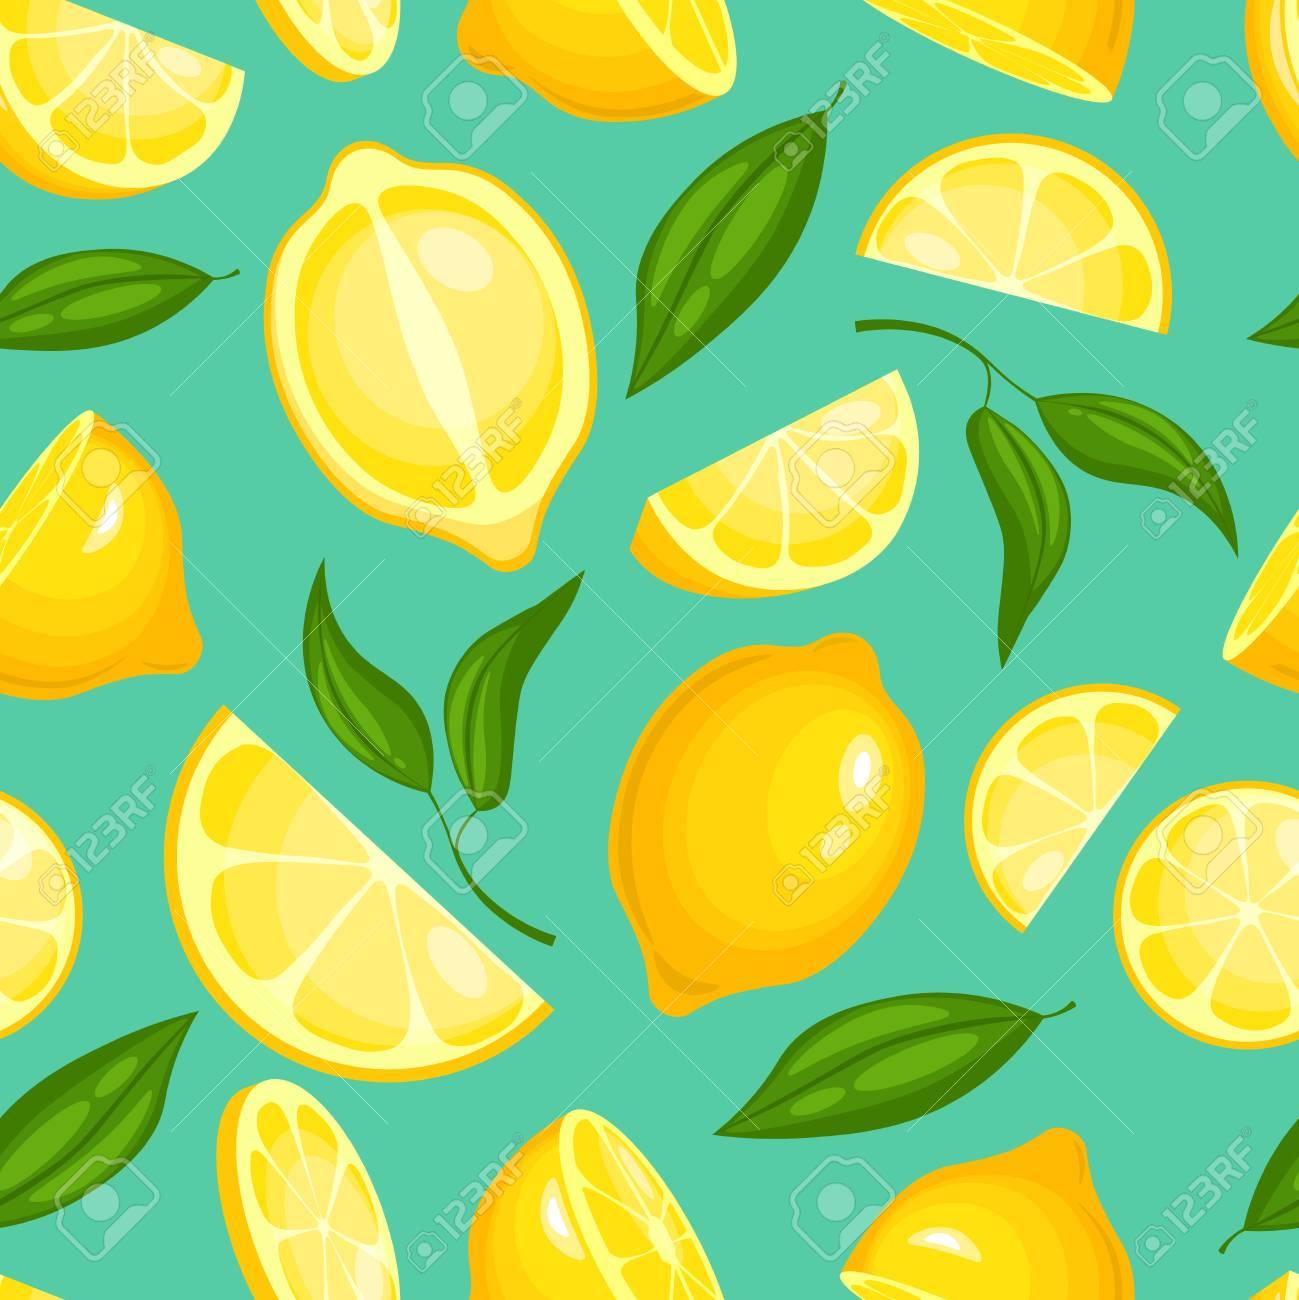 Lemon Pattern Lemonade Exotic Yellow Juicy Fruit With Leaves 1299x1300